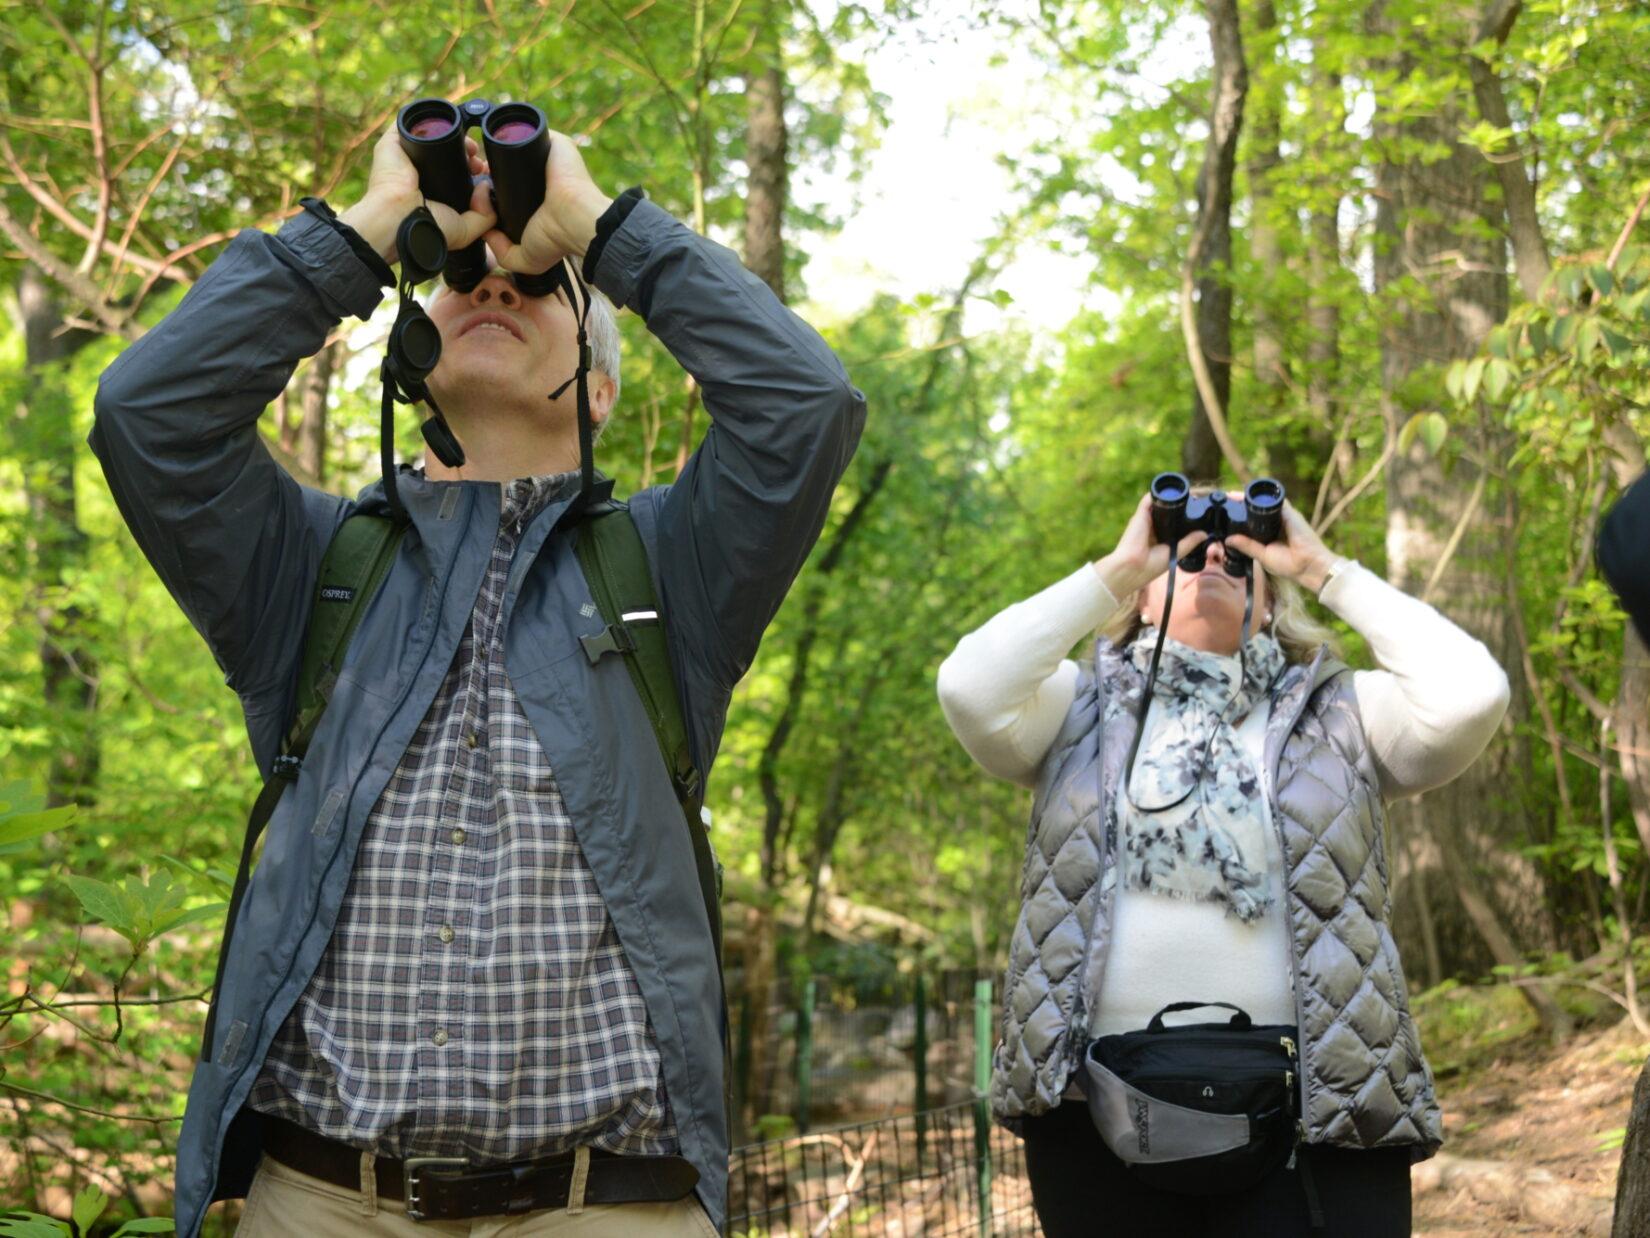 Birders behind binoculars focus on the canopy of the Hallett Nature Sanctuary